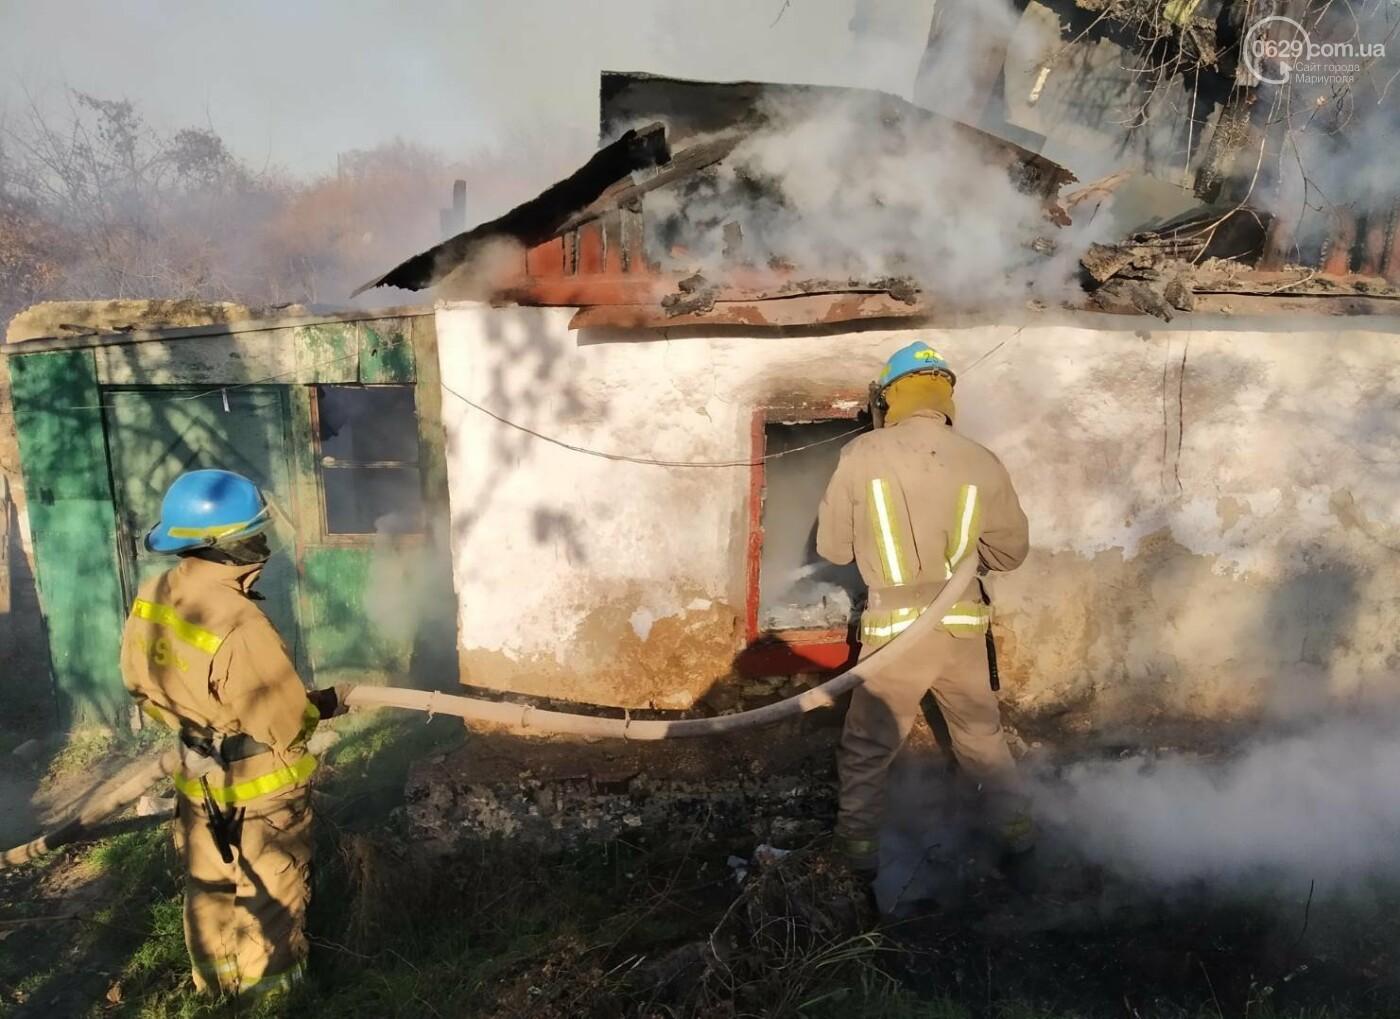 Мариуполец едва не погиб во время пожара,- ФОТО, фото-1